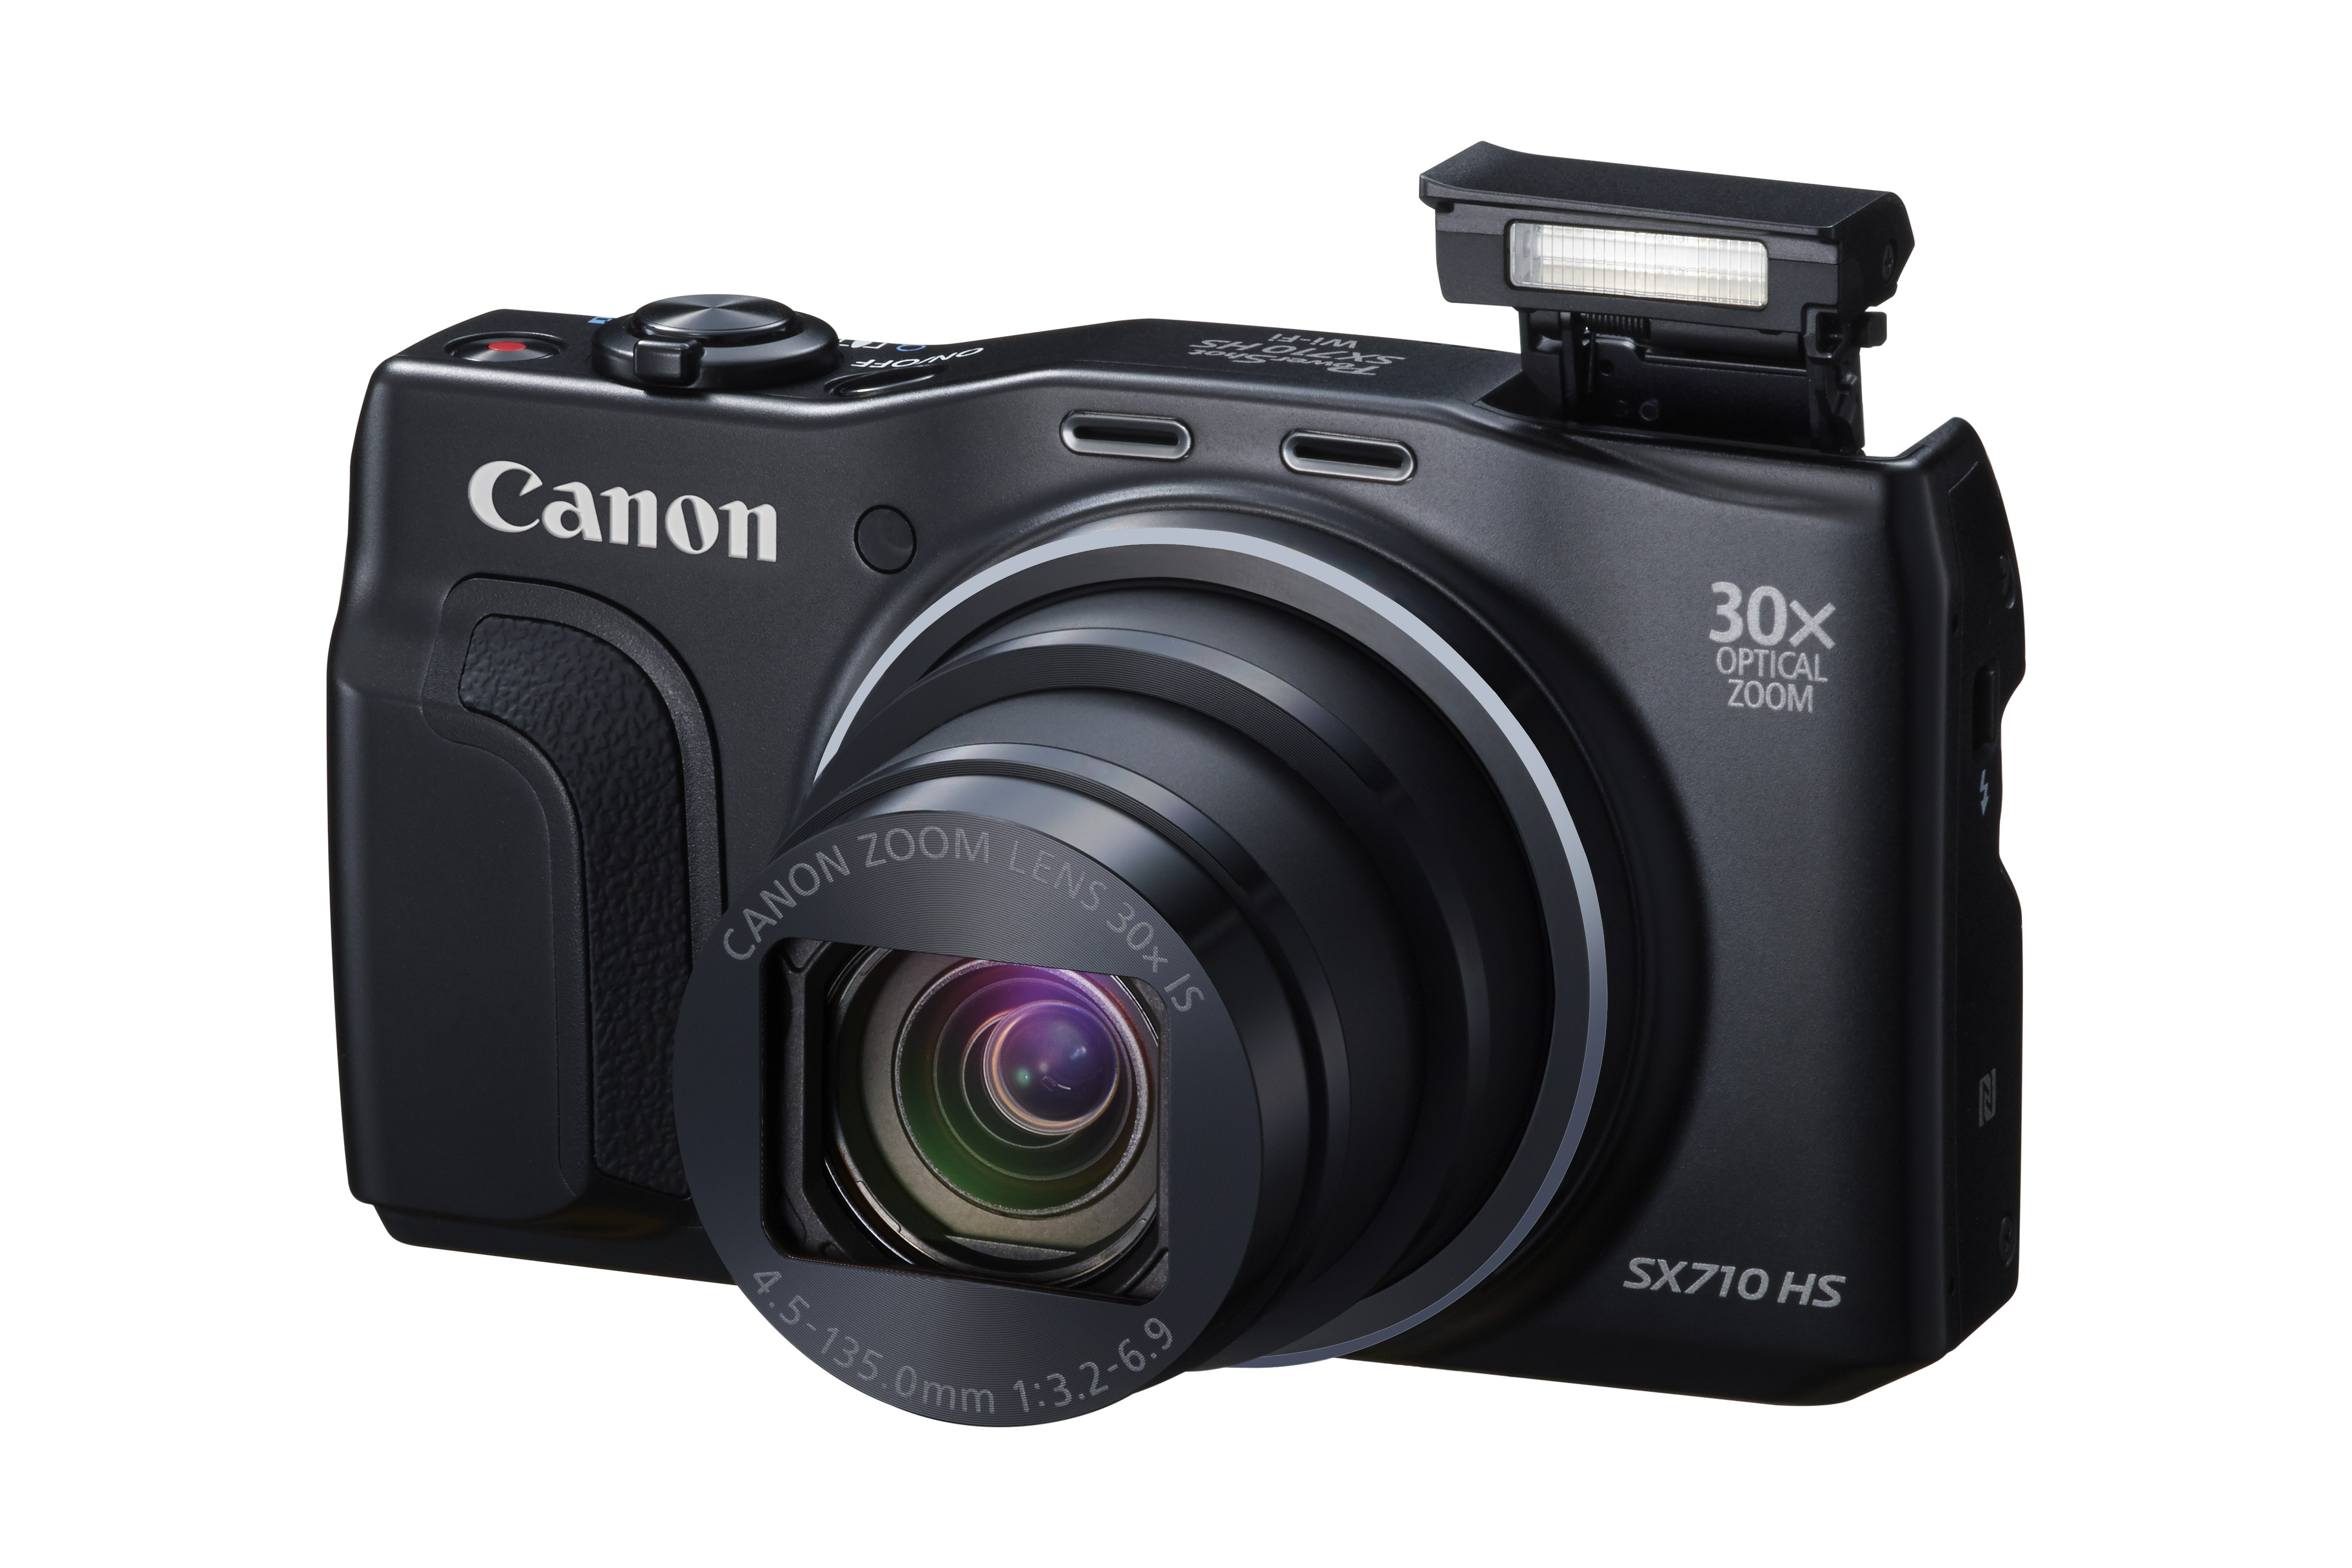 appareil photo qualite prix